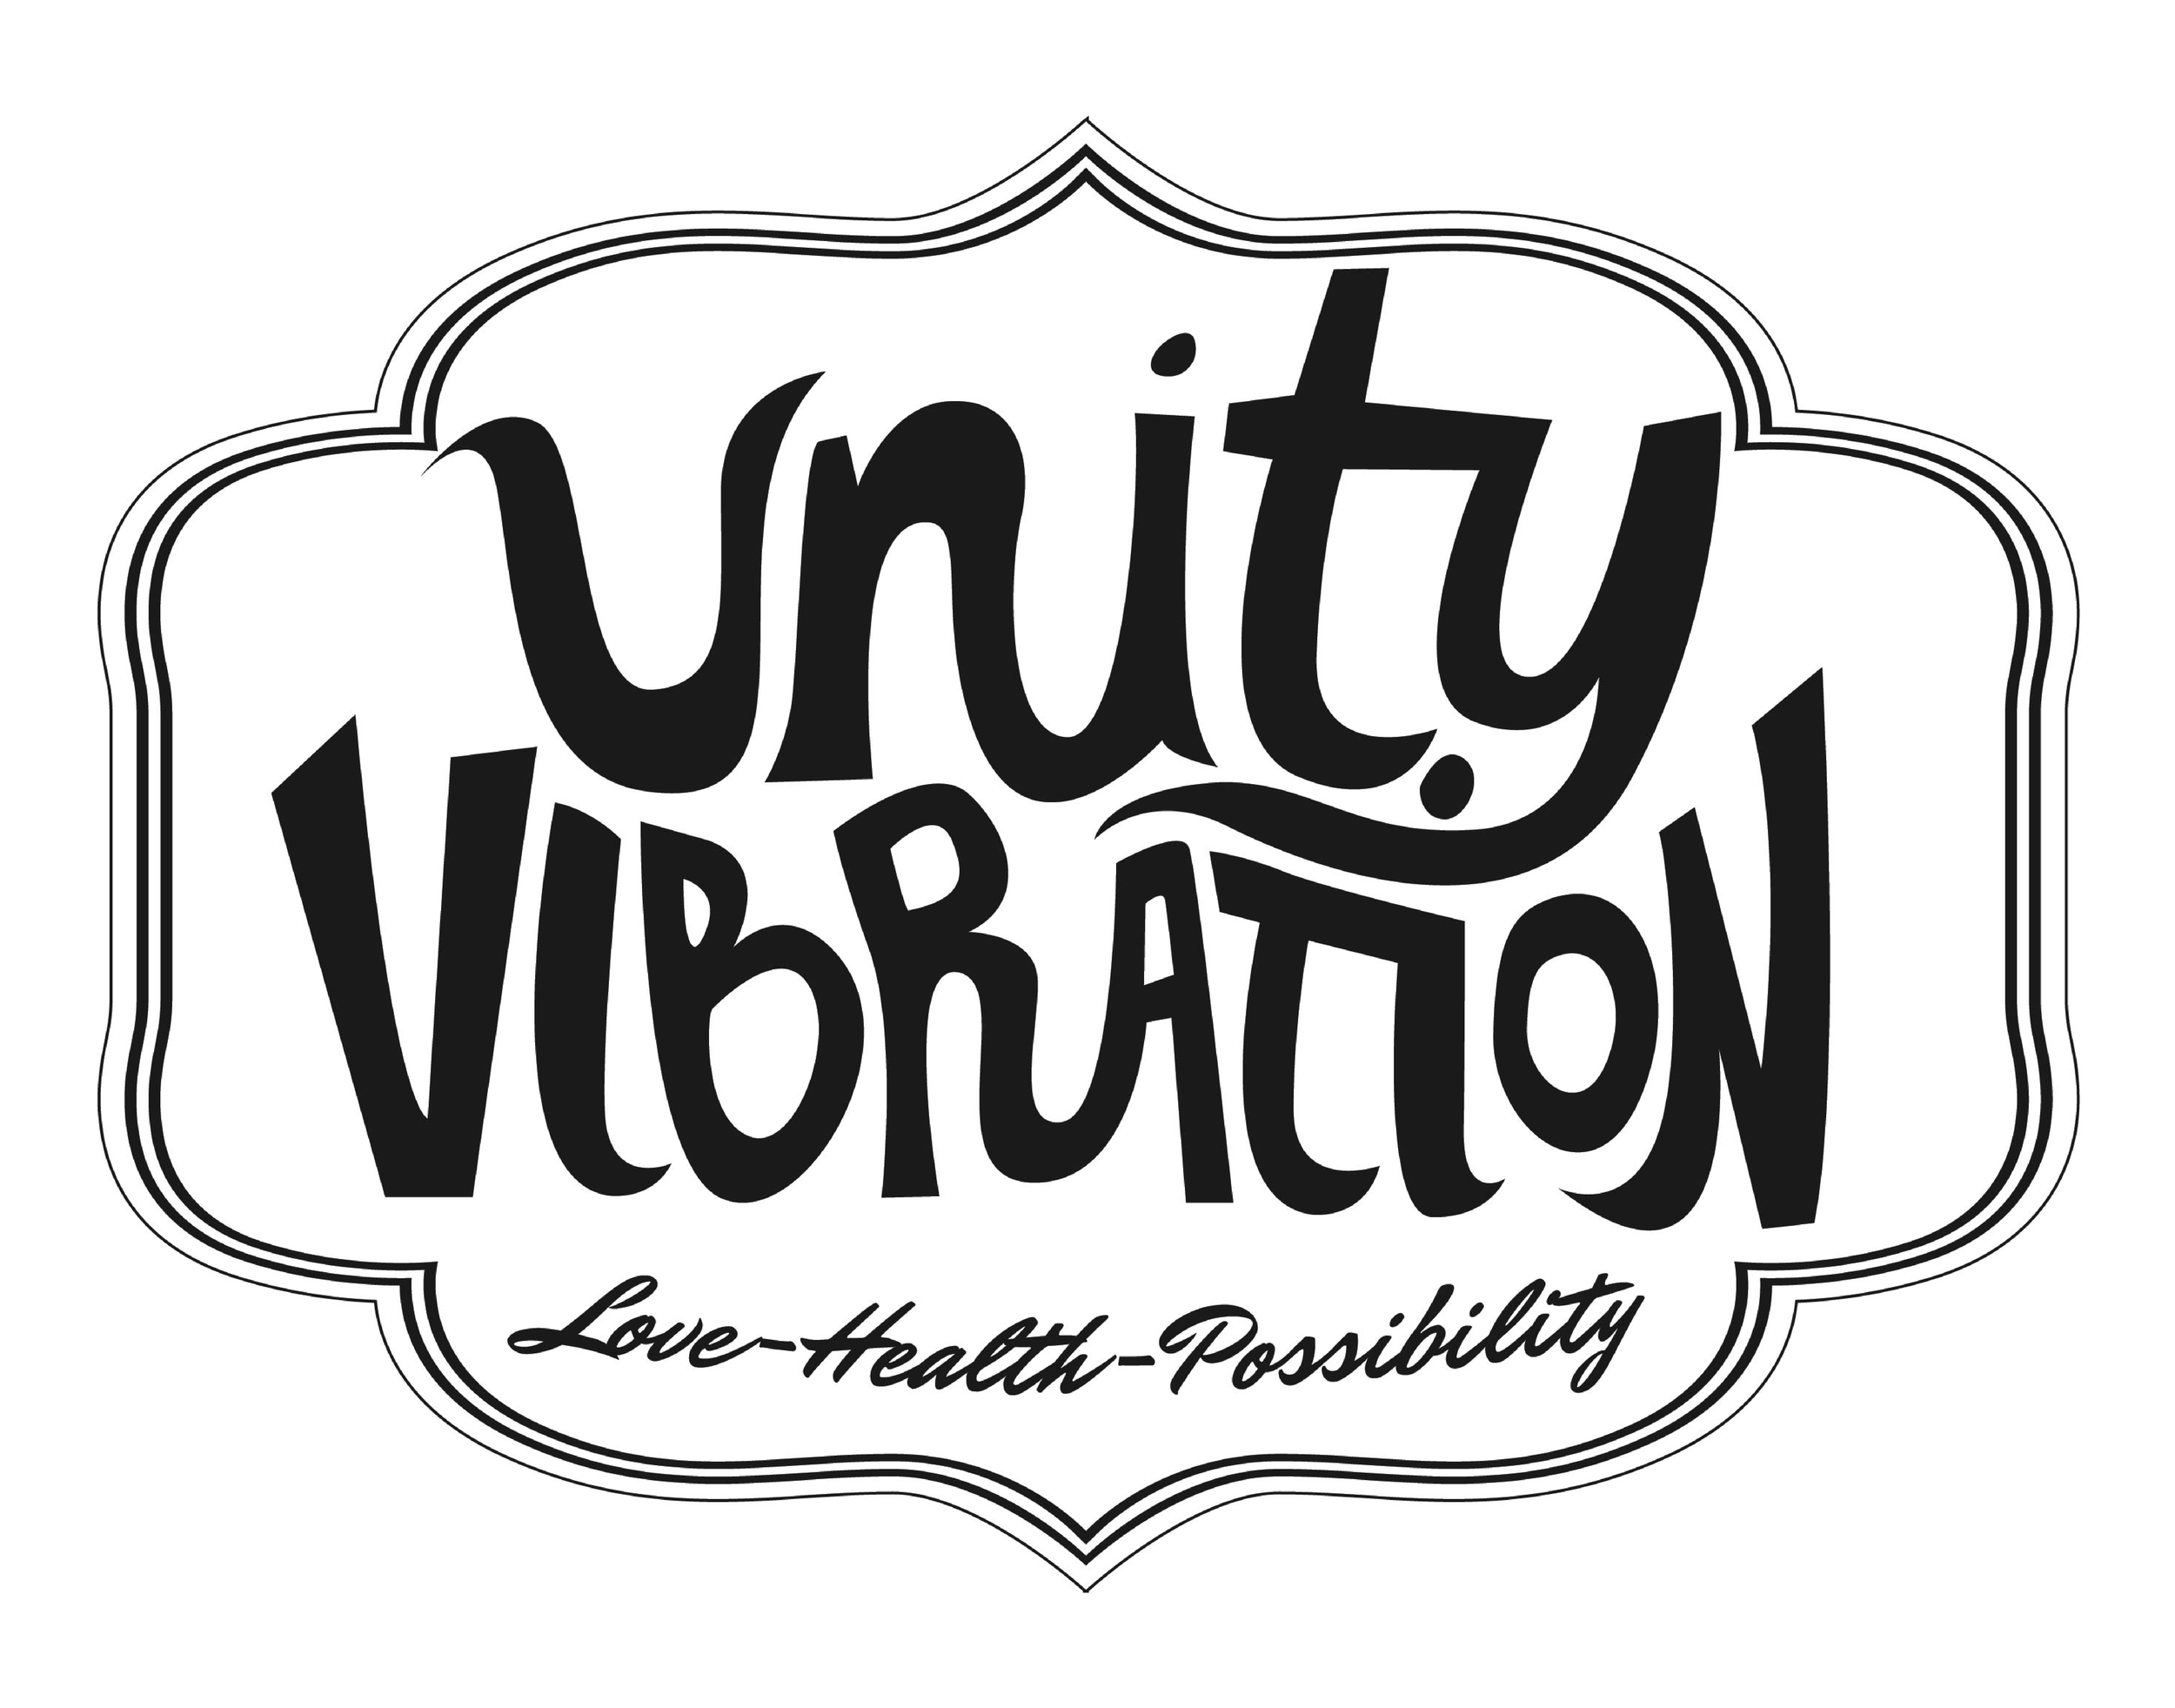 Unity Vibration logo. Links to Unity Vibration website.